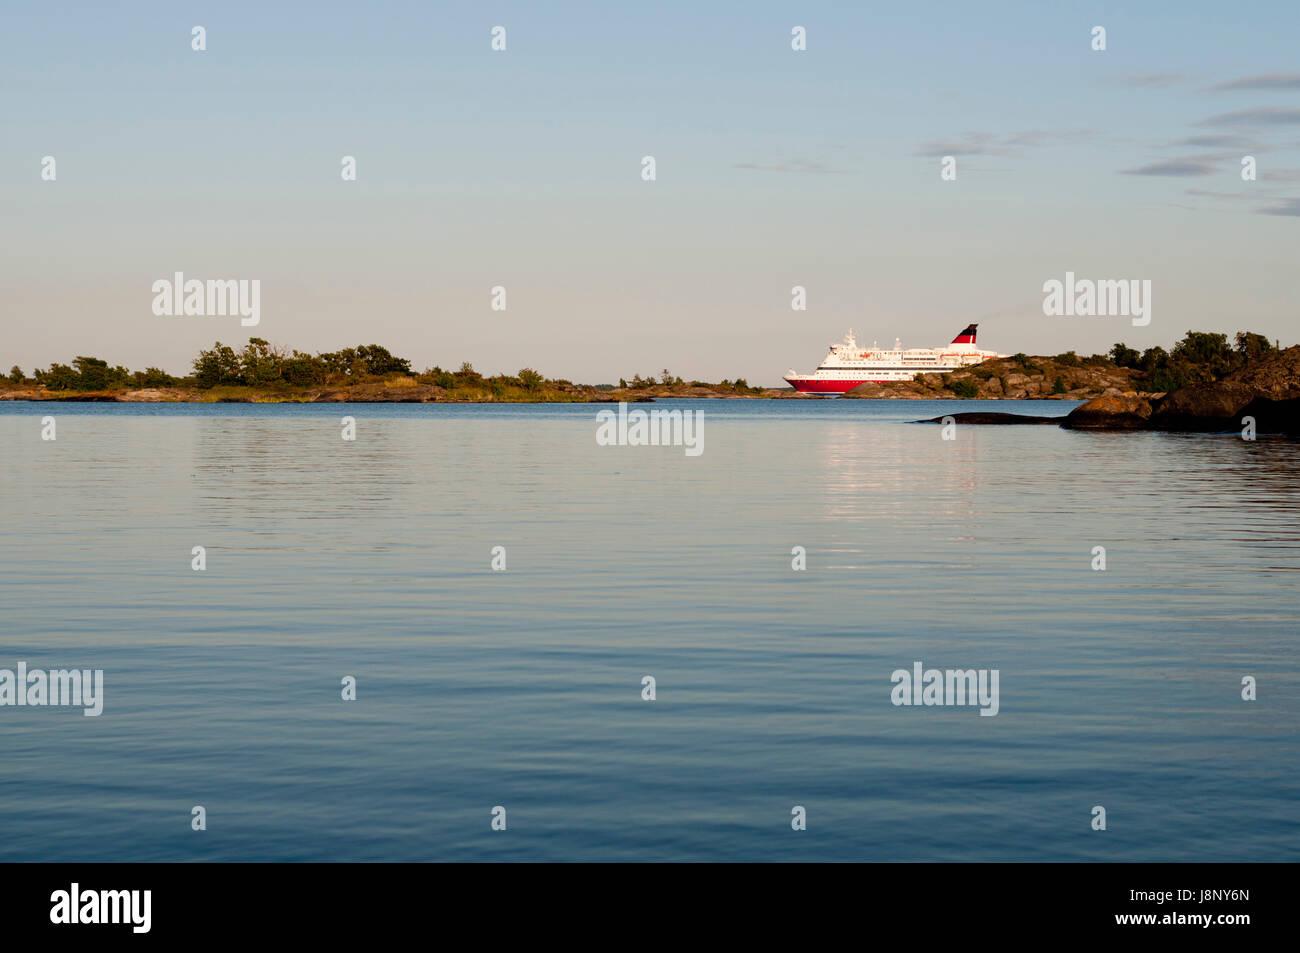 Fähre Schiff bei Sonnenuntergang Stockfoto